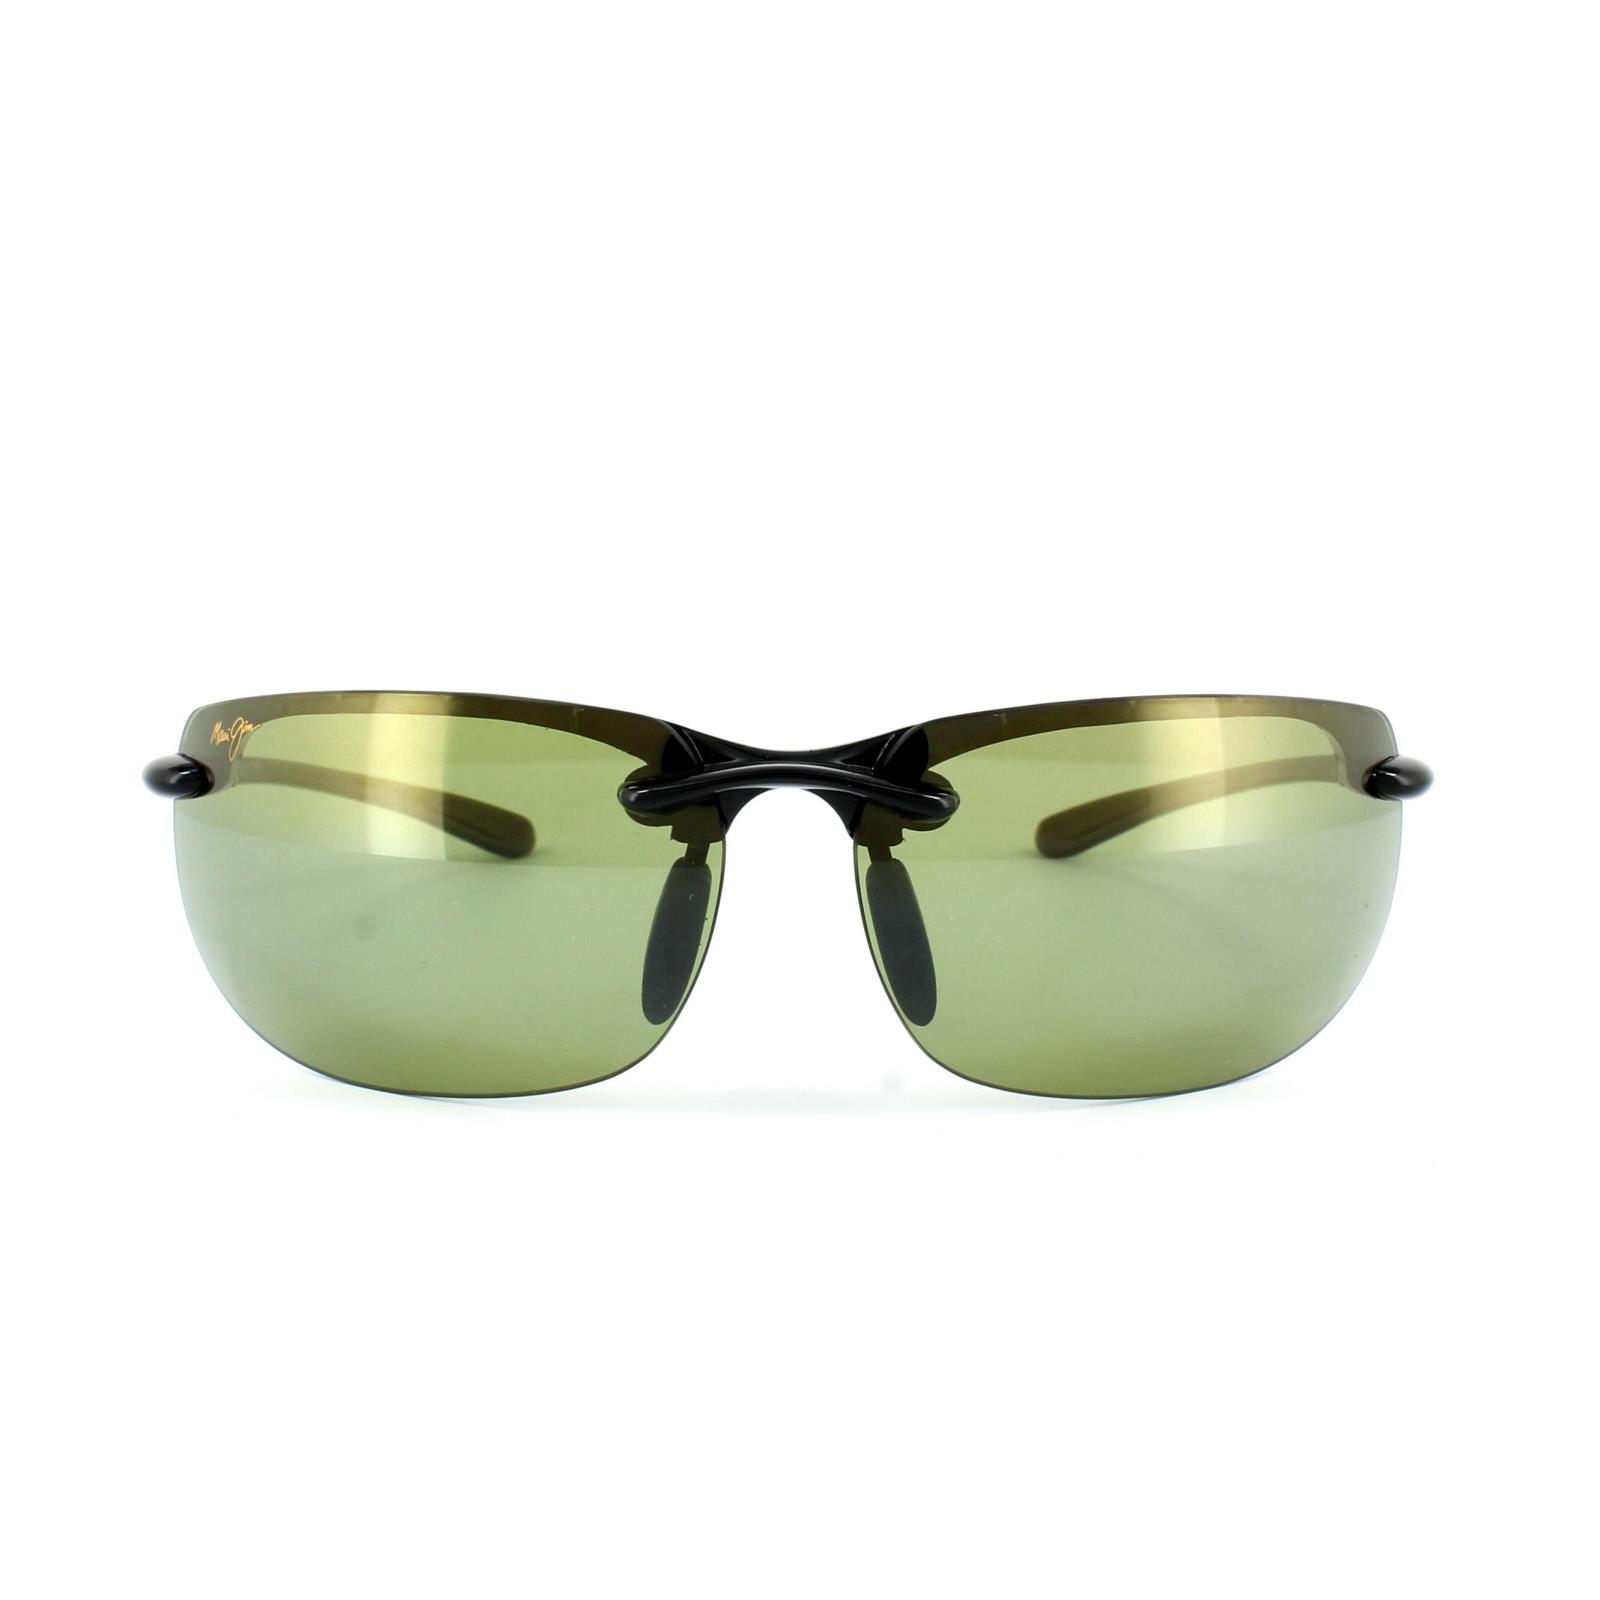 f9c2970d507 Sentinel Maui Jim Sunglasses Banyans HT412-02 Gloss Black Maui HT Green  Polarized